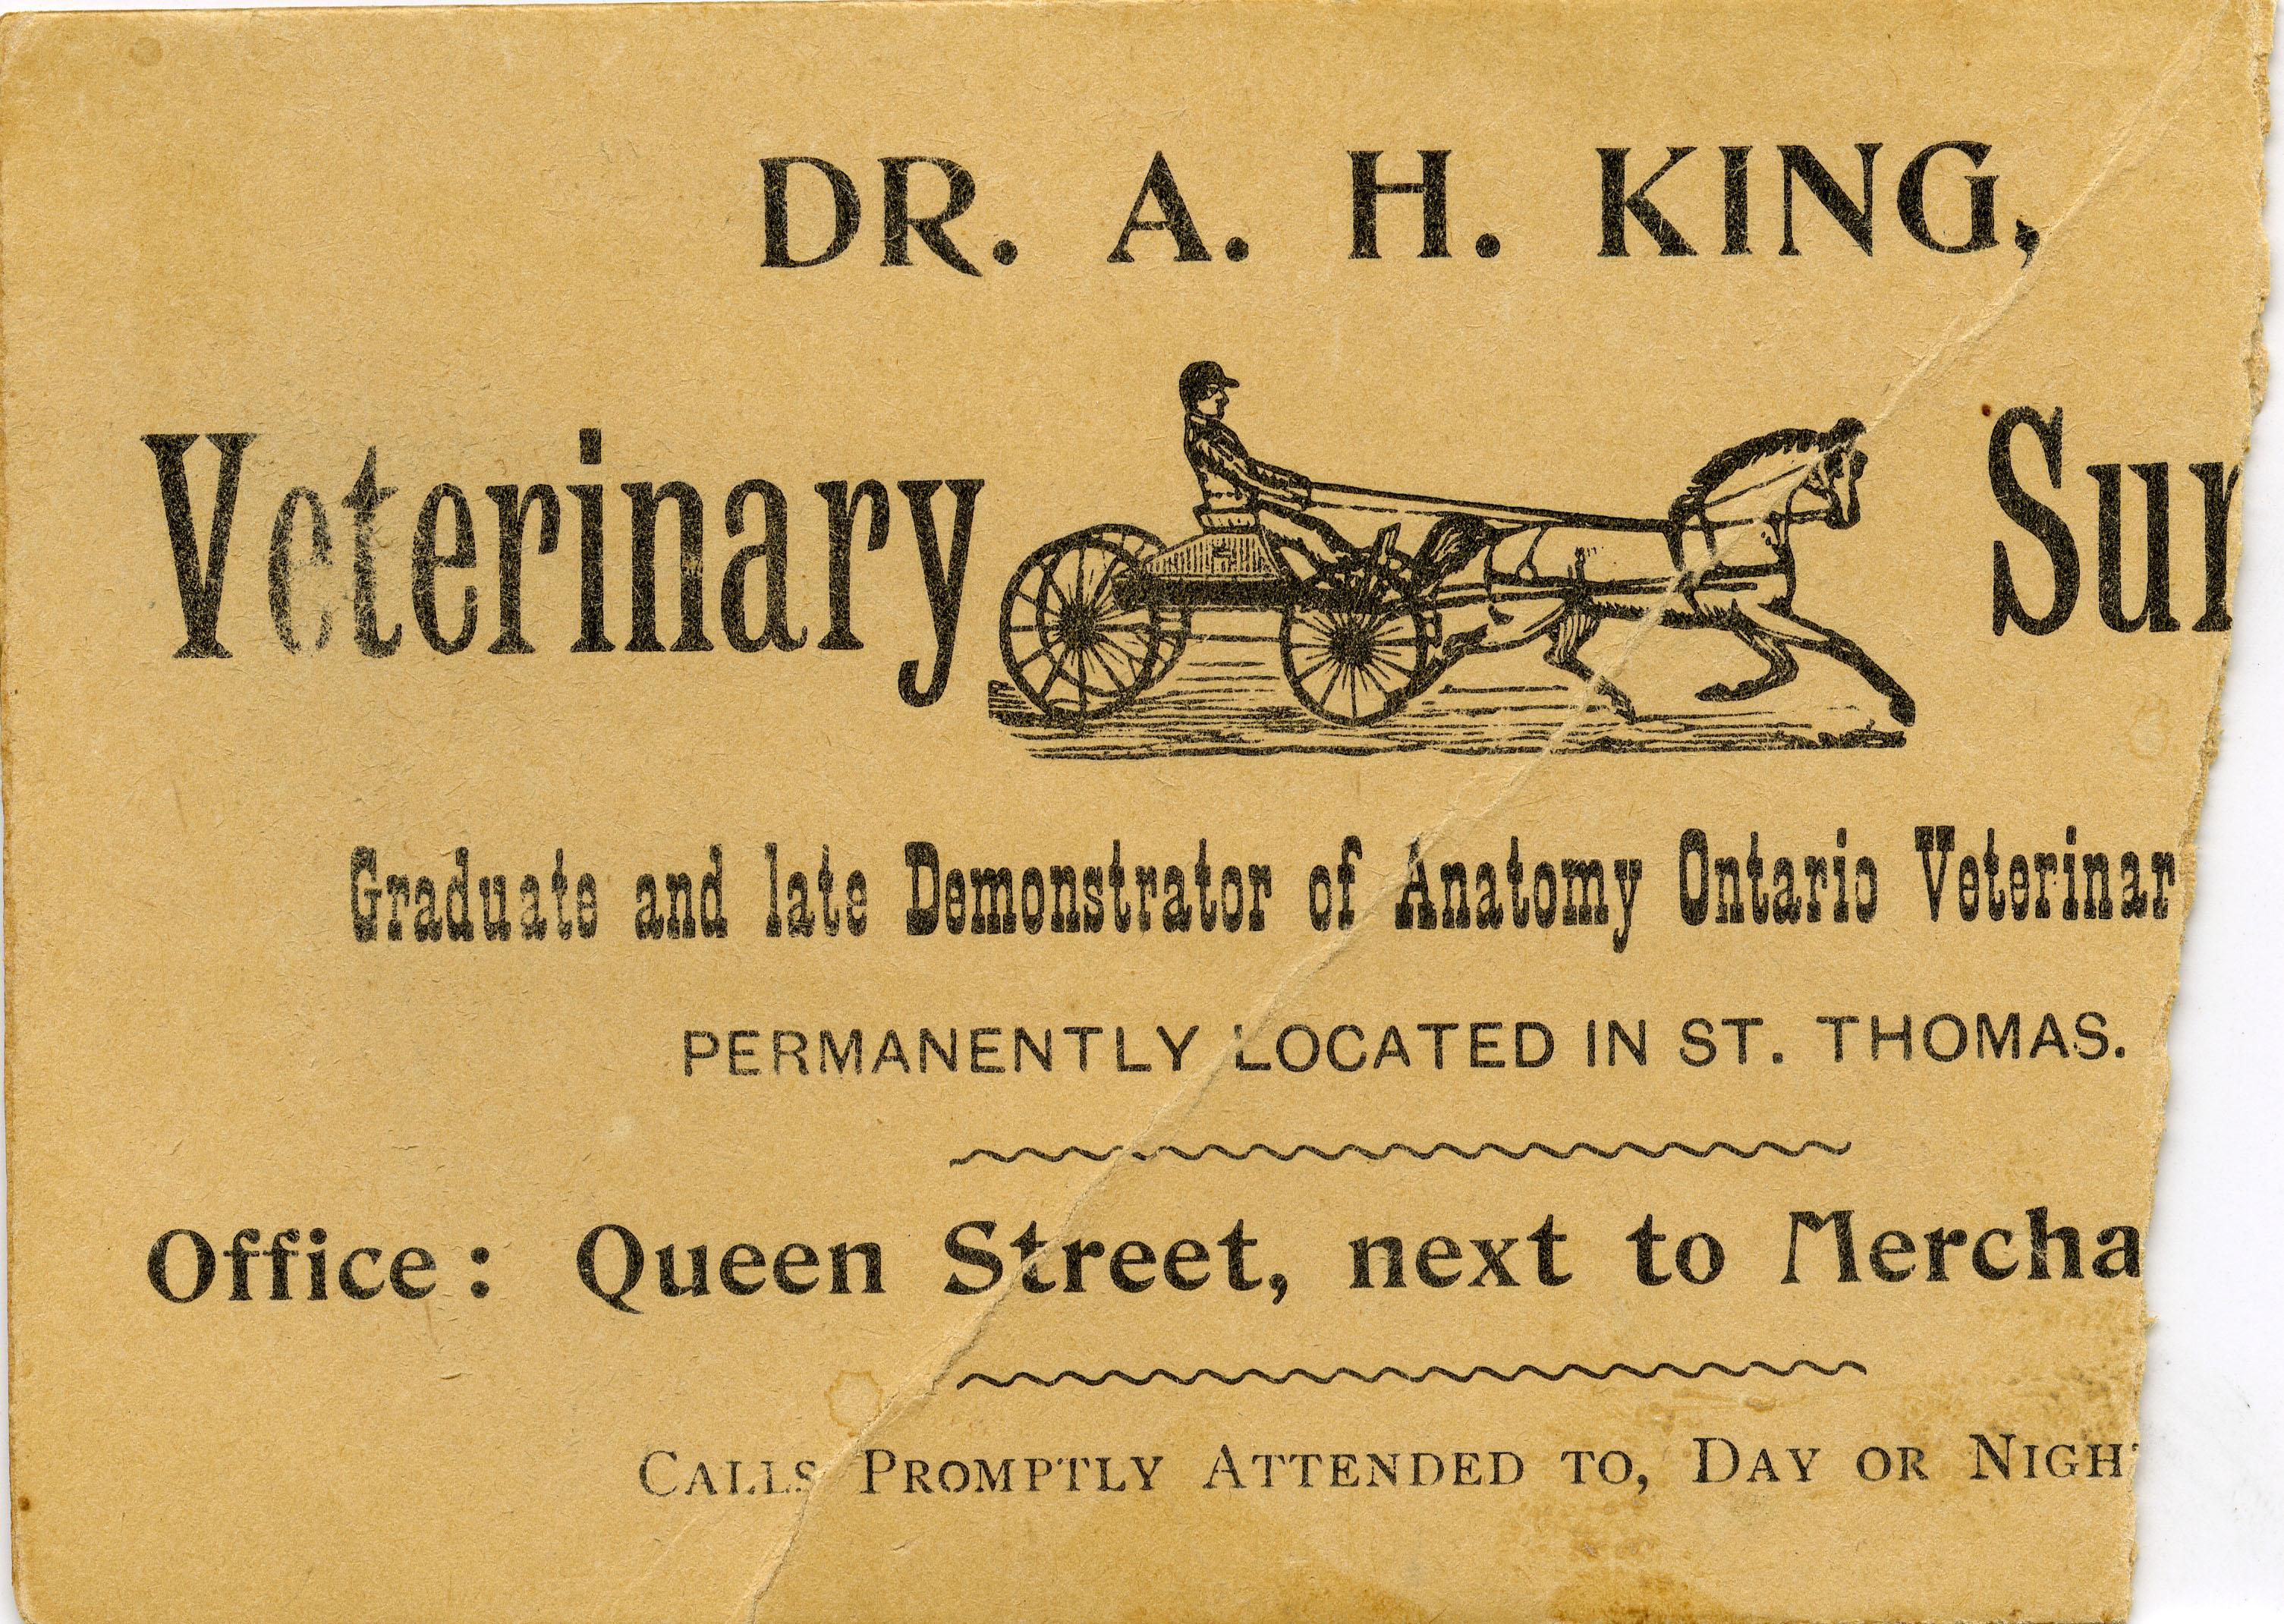 A.H. King V.S. Business Card